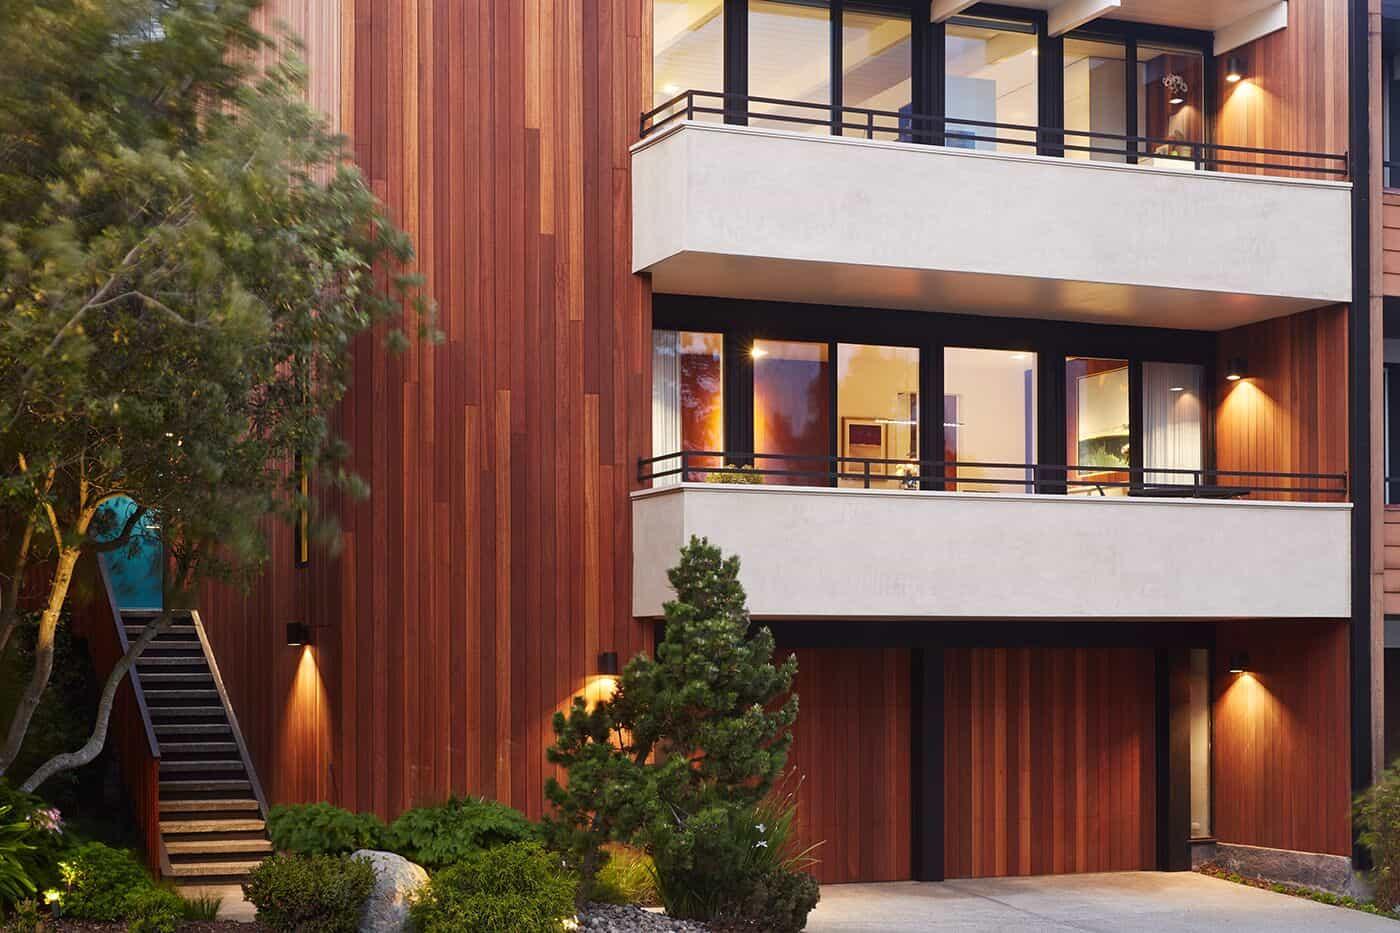 San Francisco Eichler Remodel-Klopf Architecture-20-1 Kindesign